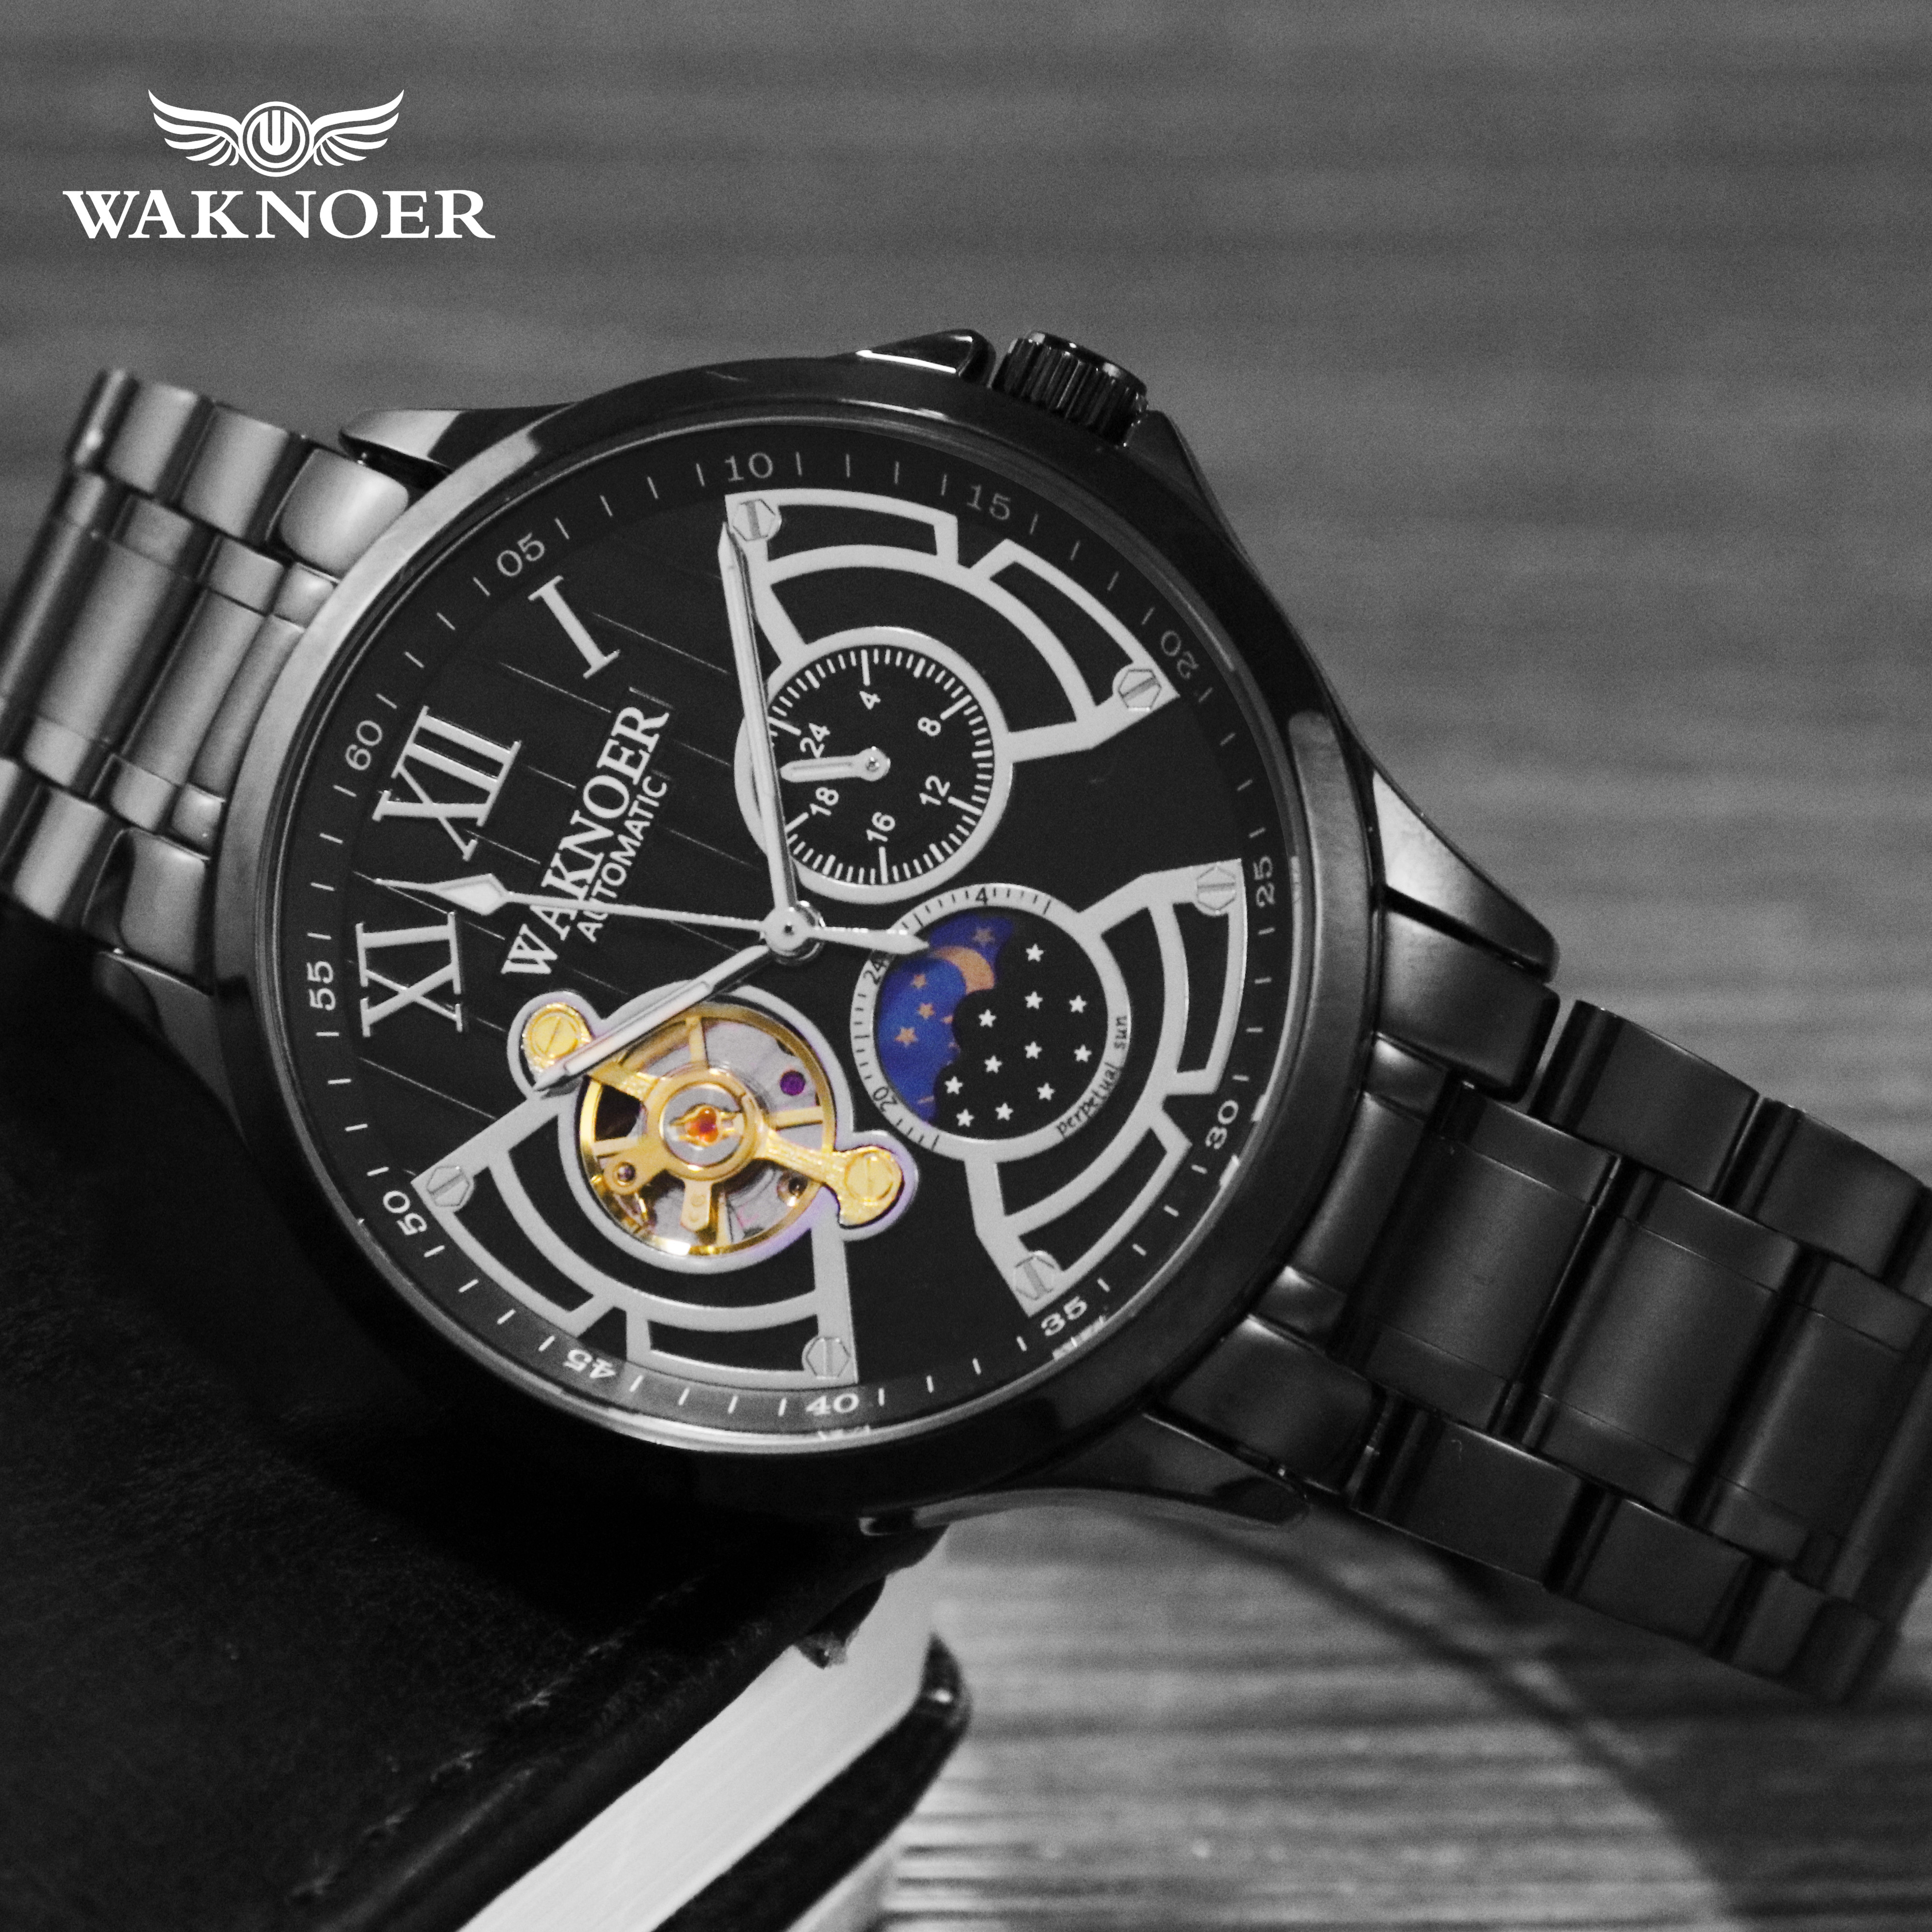 WAKNOER Automatic Mechanical Watch Men Stainless Waterproof Moon Phase Luminous Luxury Gold Business Tourbillon Montre Homme Innrech Market.com